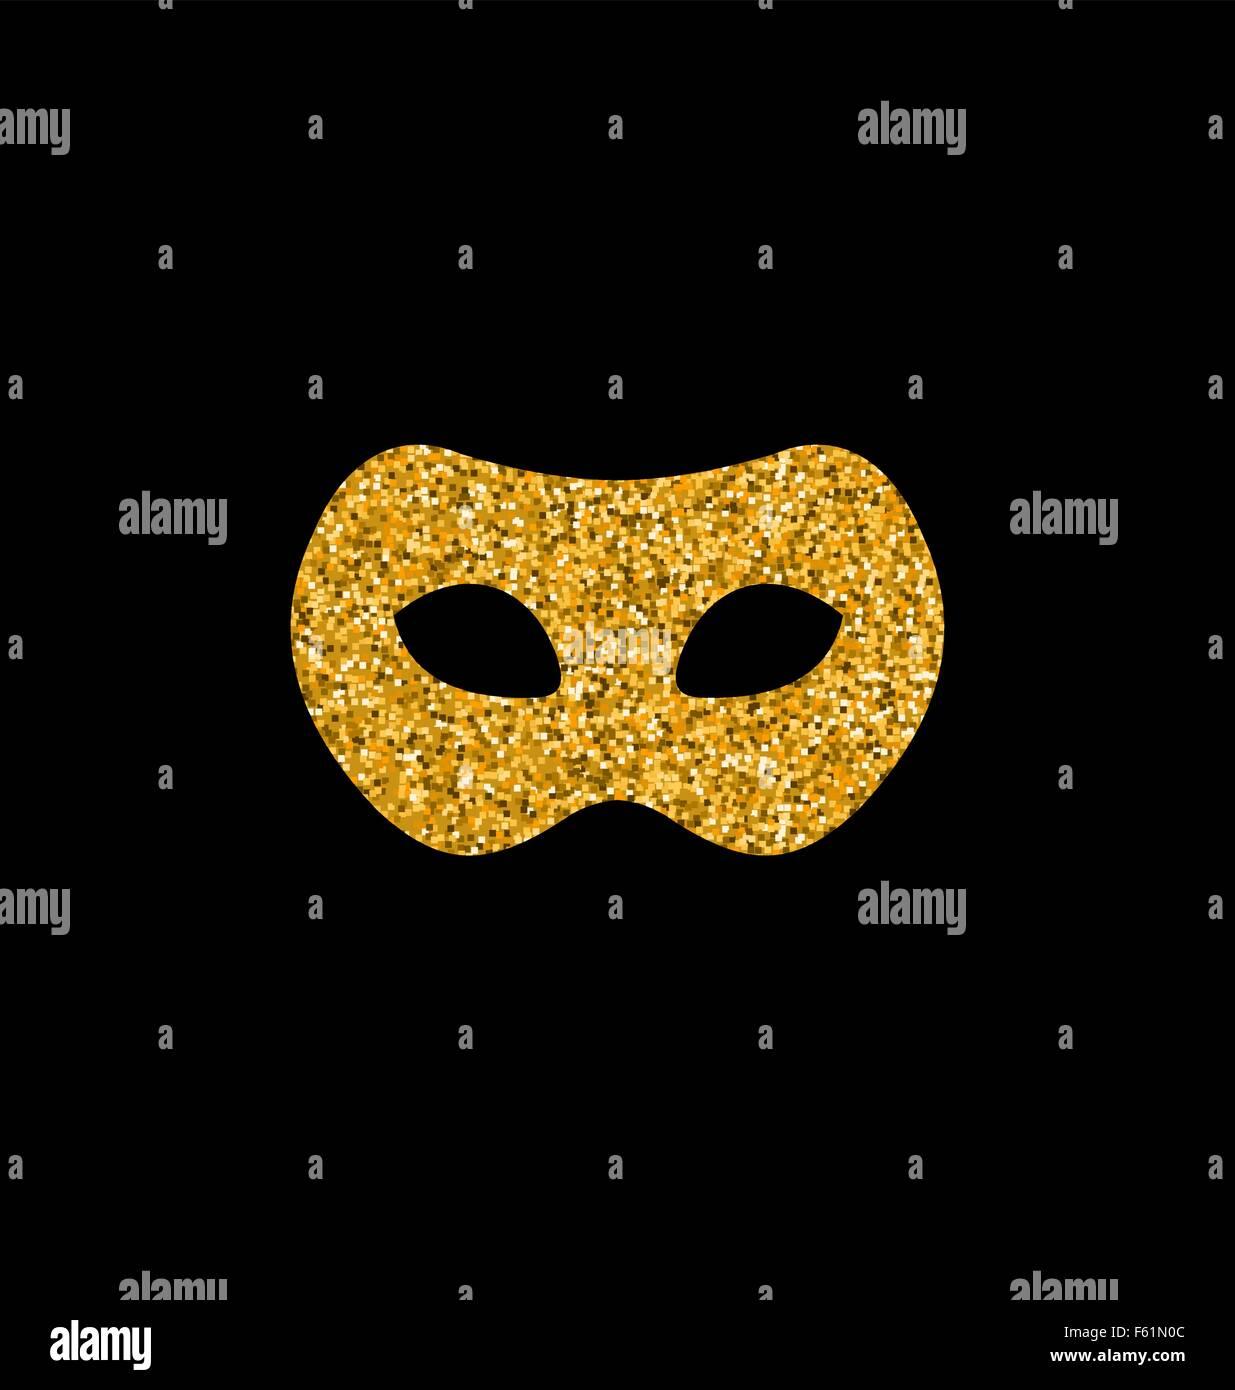 Golden Glittering Carnival or Theater Mask Stock Vector